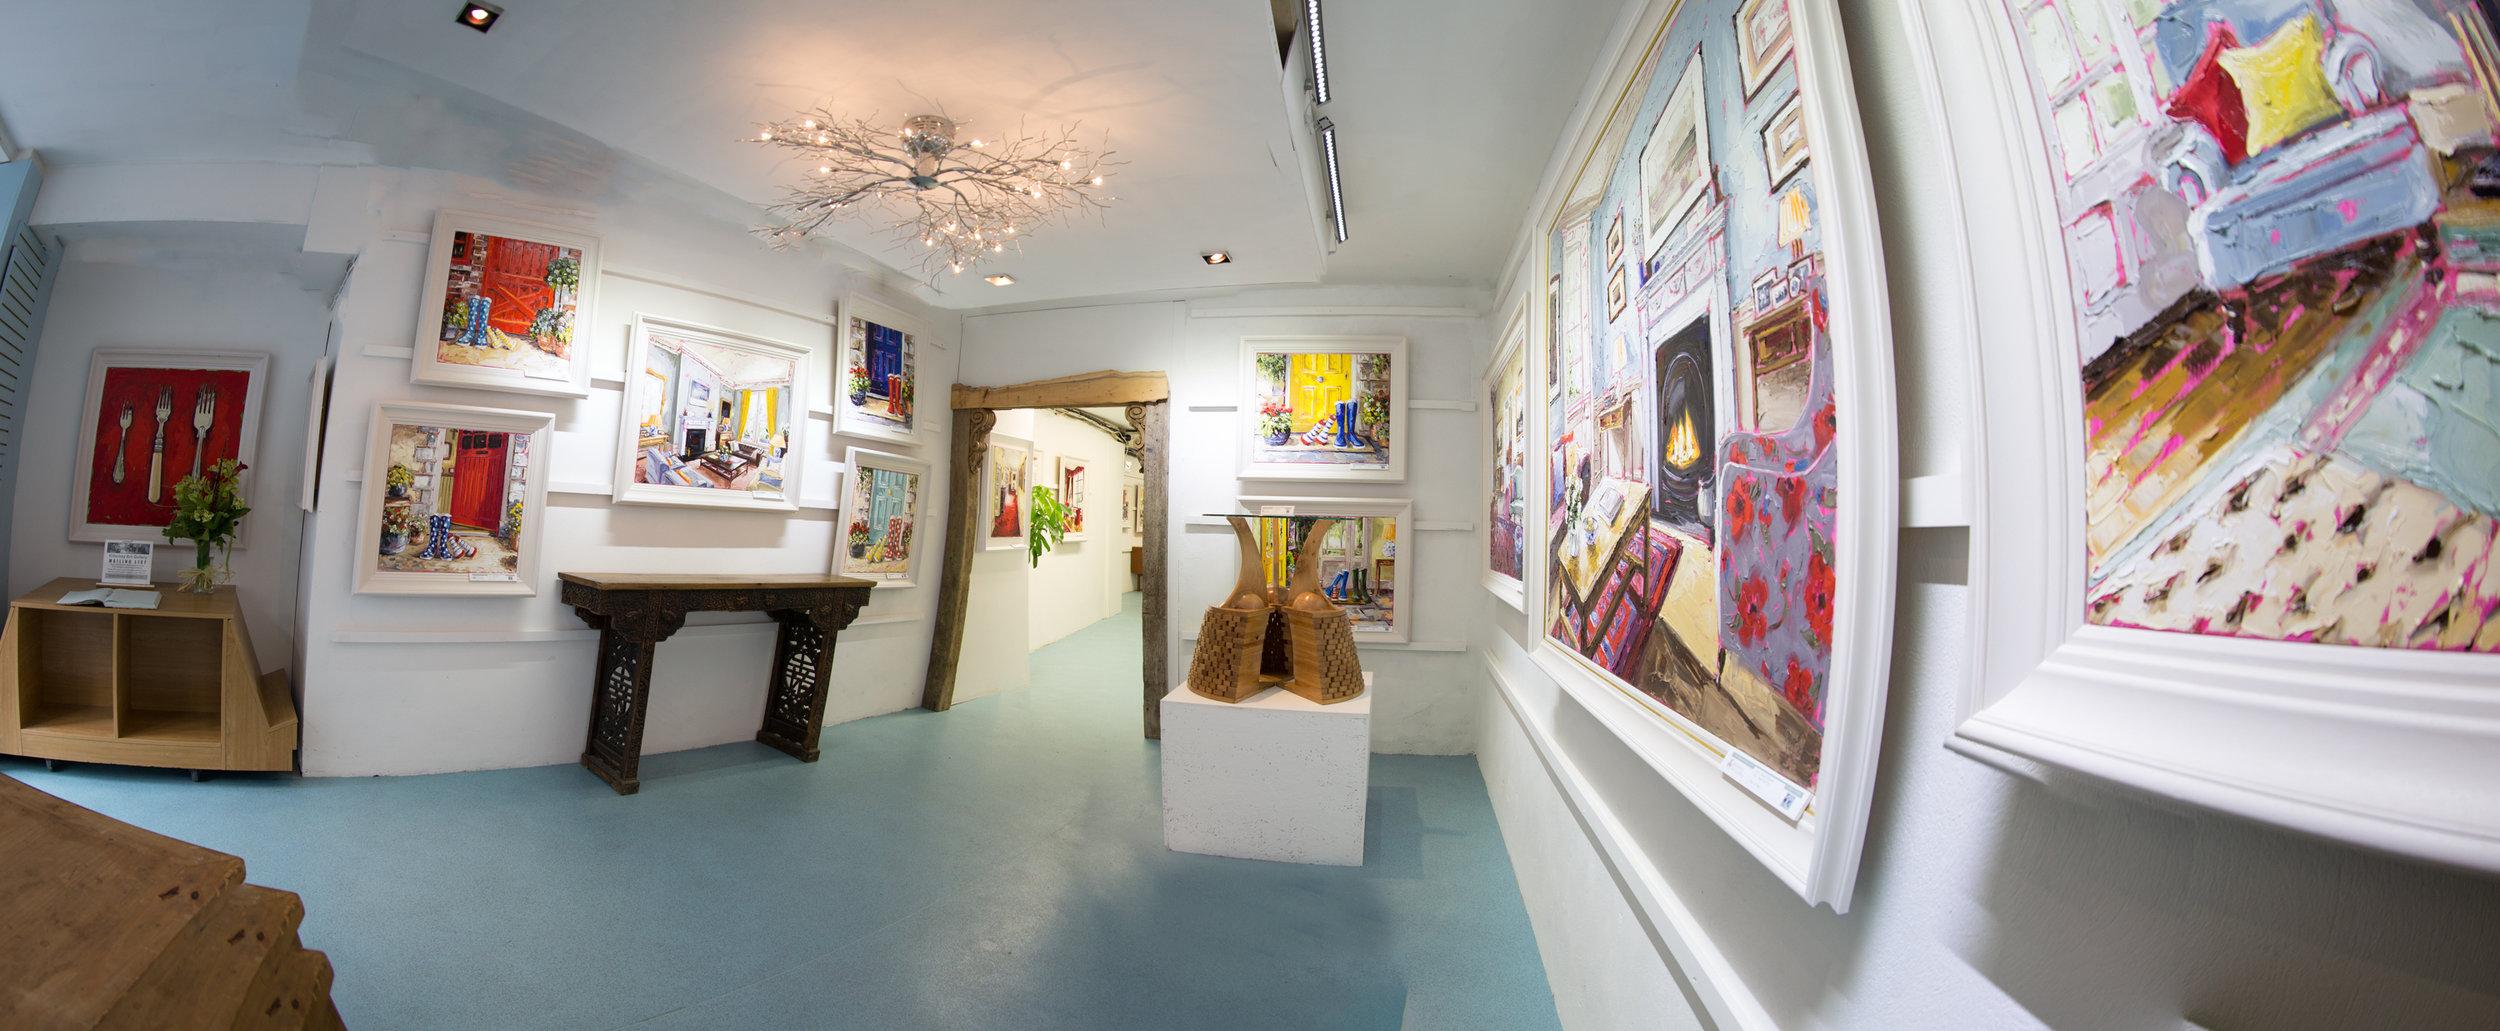 Killarney Art Gallery-30.jpg